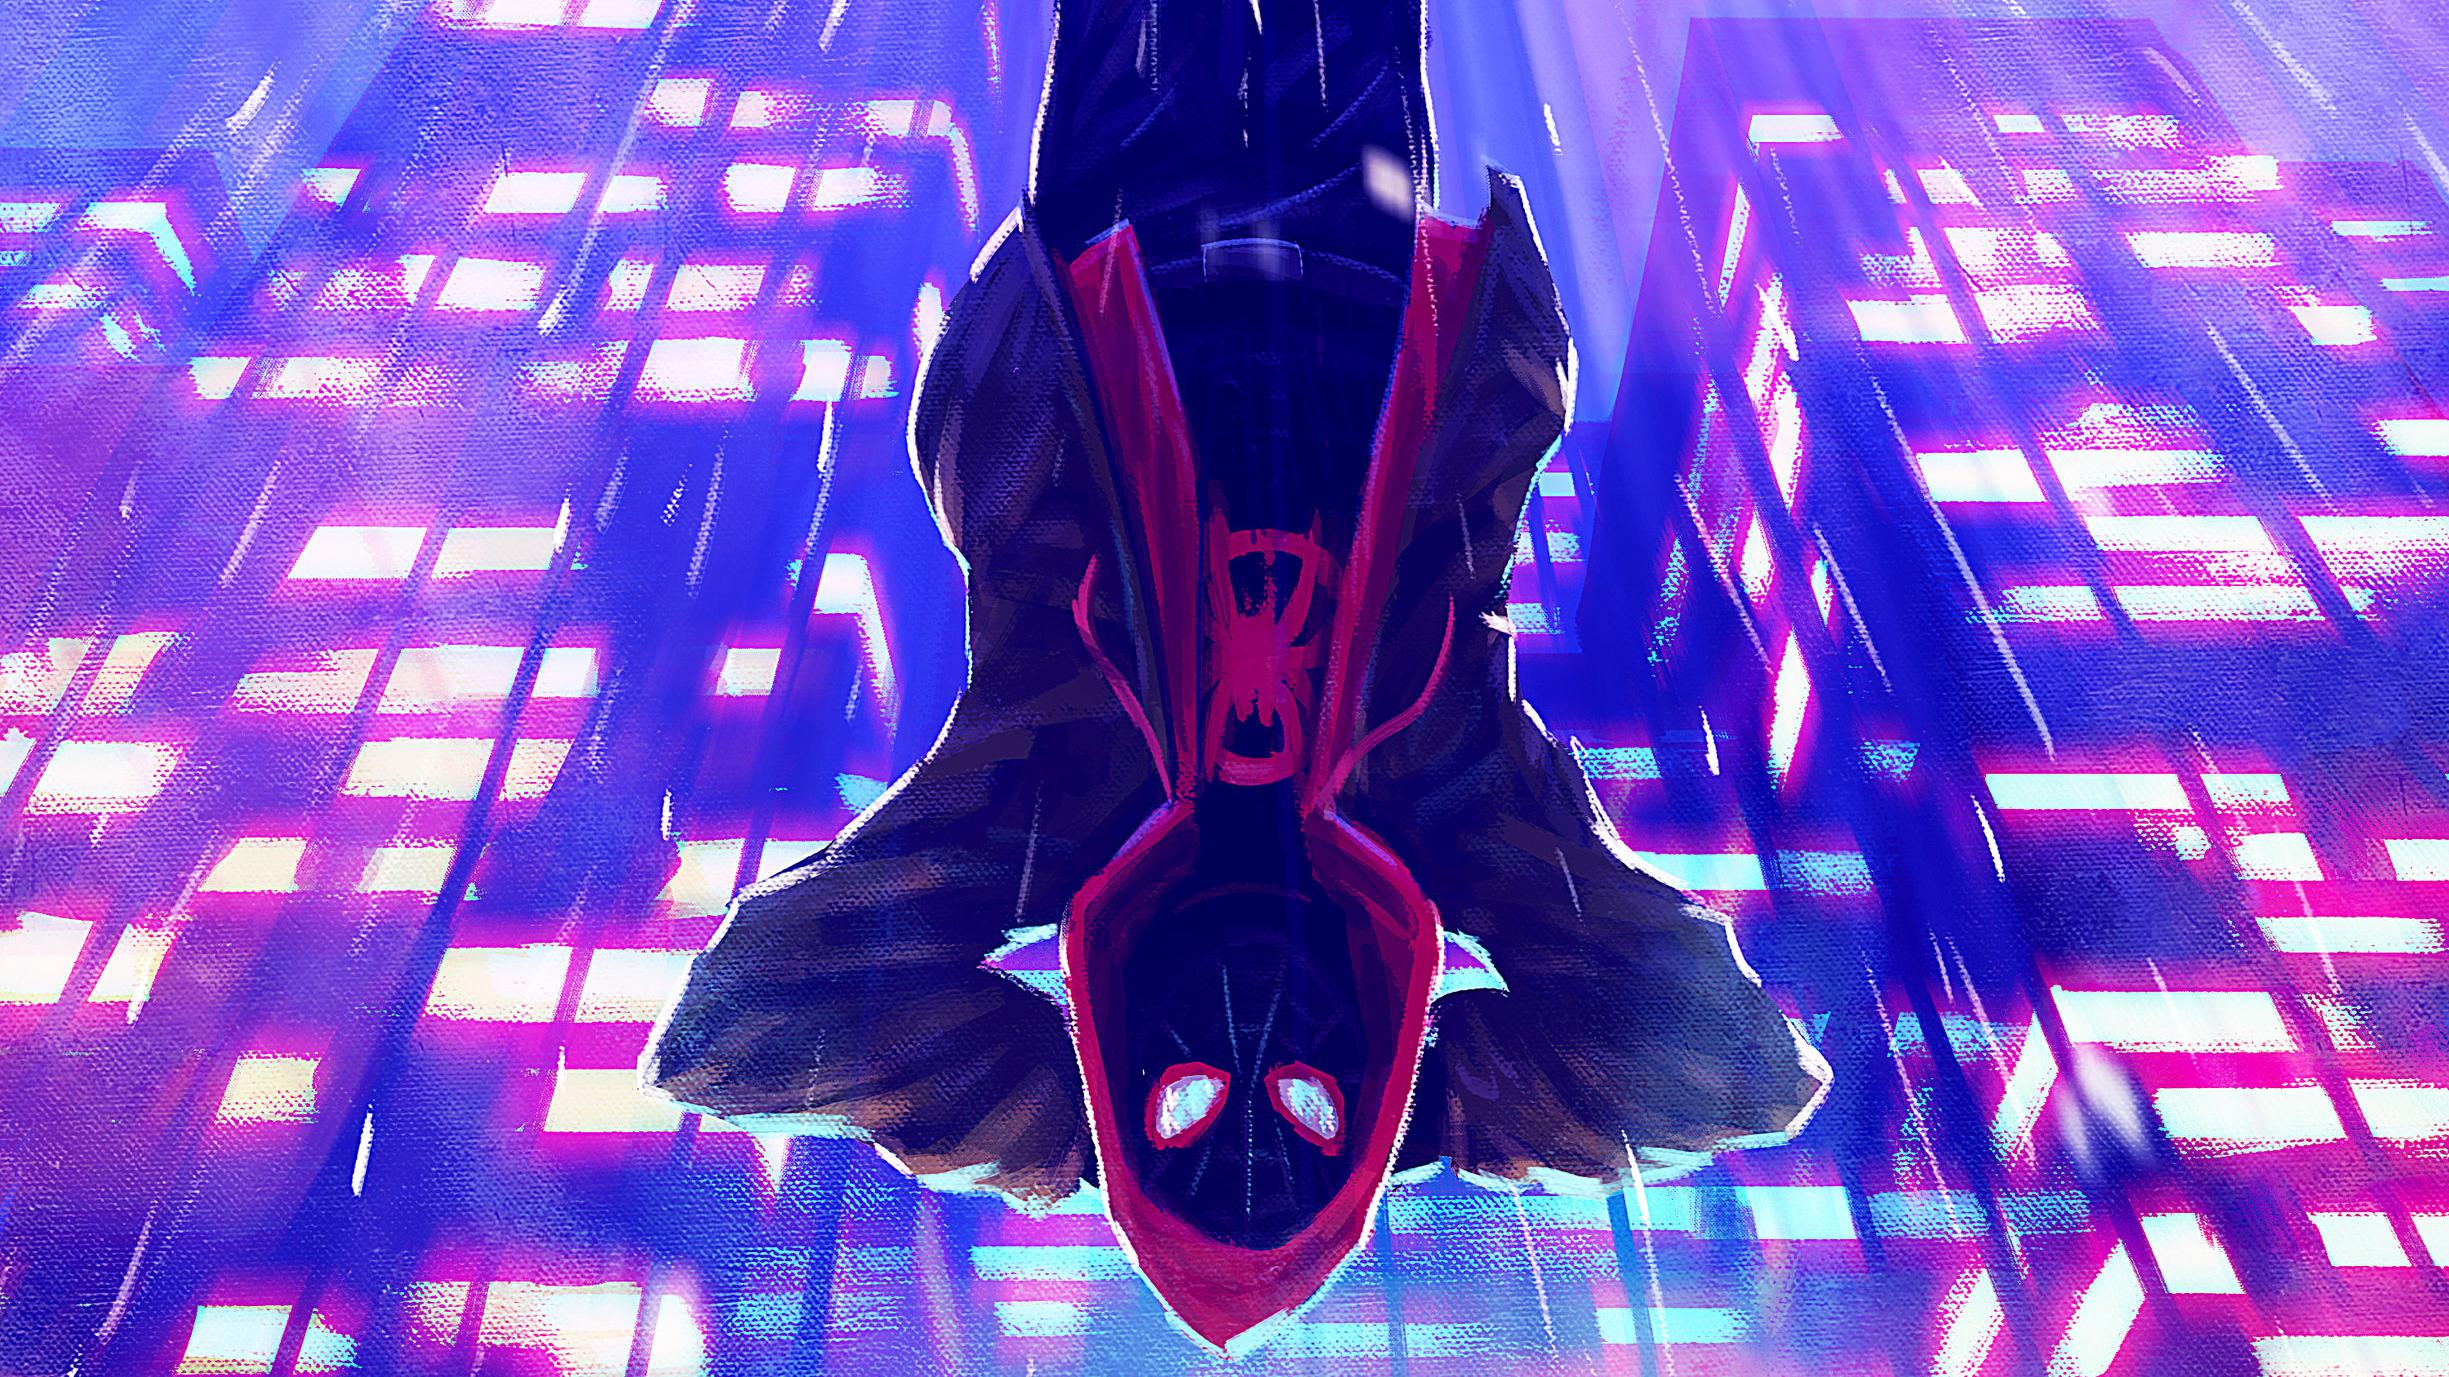 Miles Morales Spiderverse Arts, HD Superheroes, 4k ...